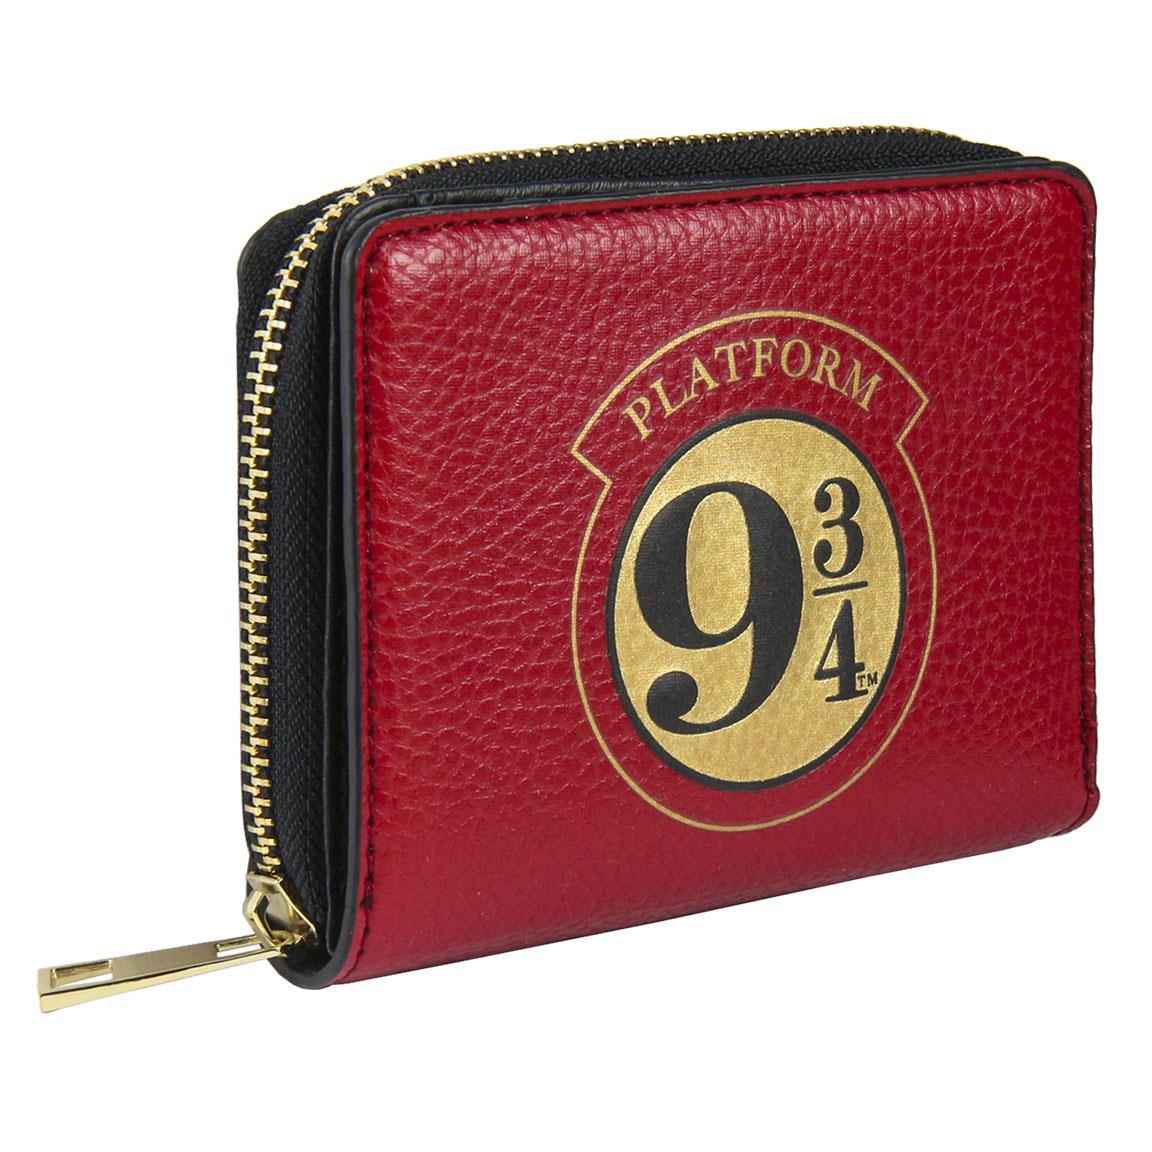 Wallet Card Holder Leatherette Harry Potter OFFICIALLY LICENSED ORIGINAL Material Approved EU